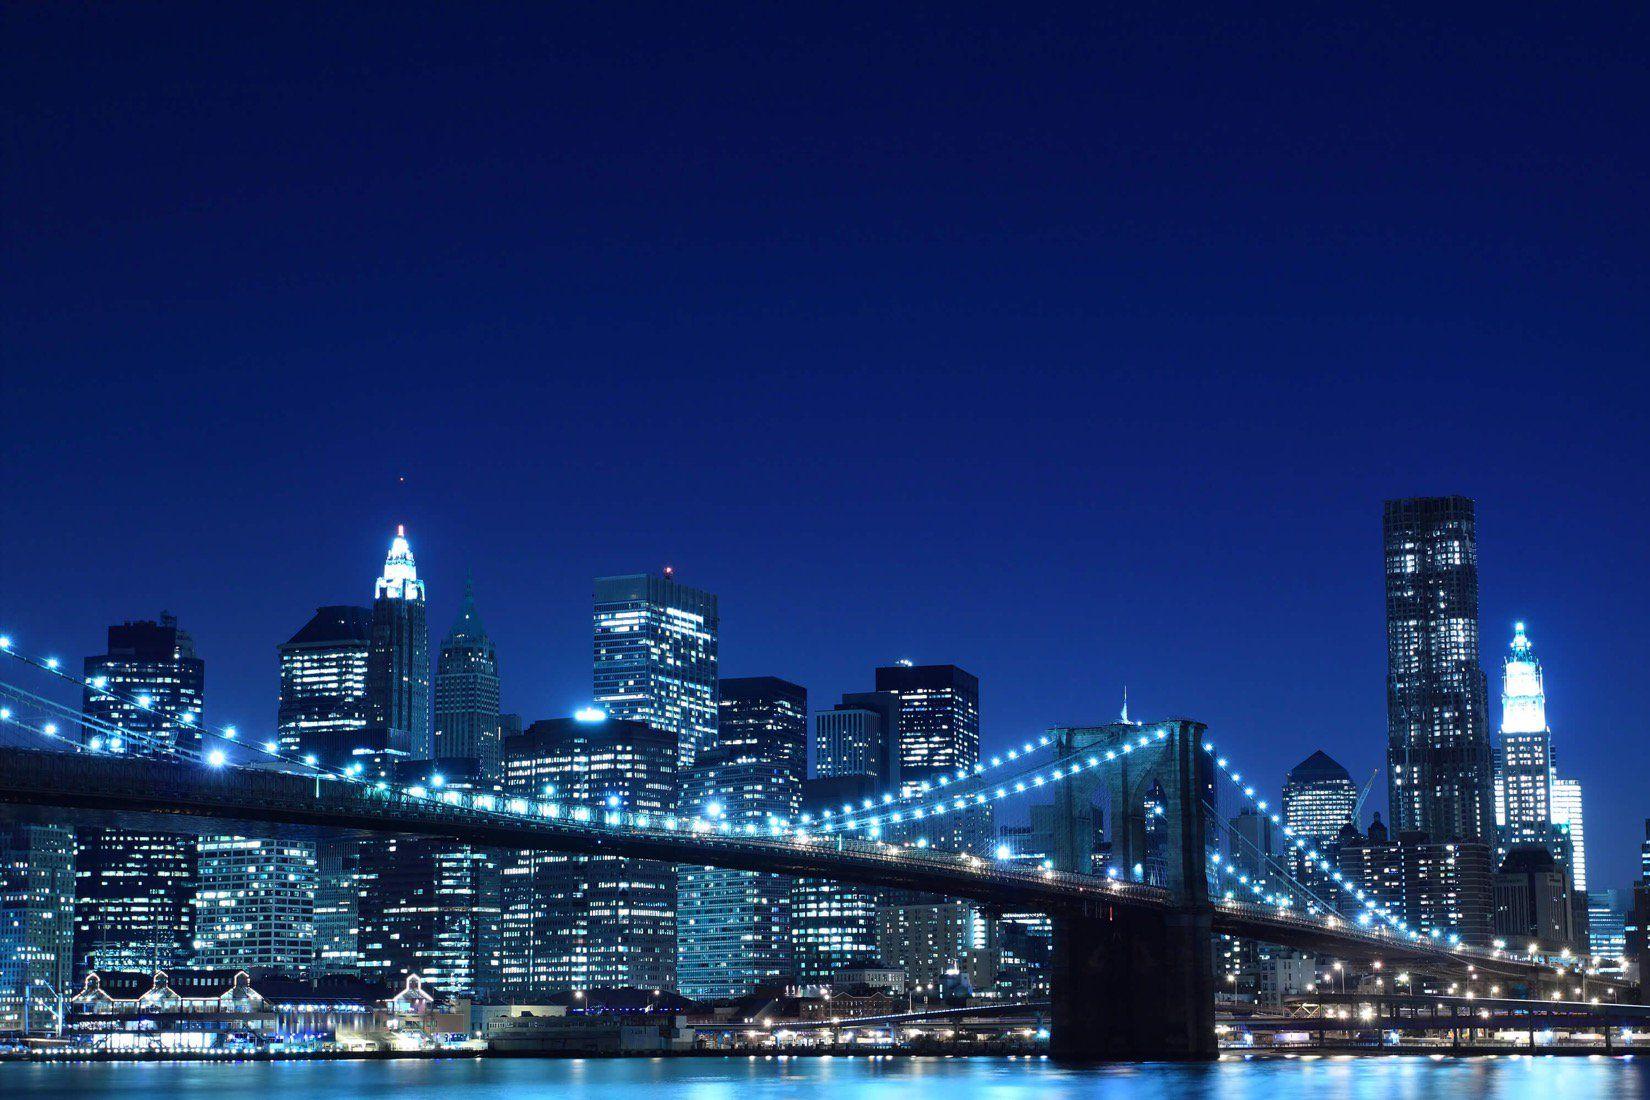 Blue Night Brooklyn Bridge Wallpaper Mural in 2020